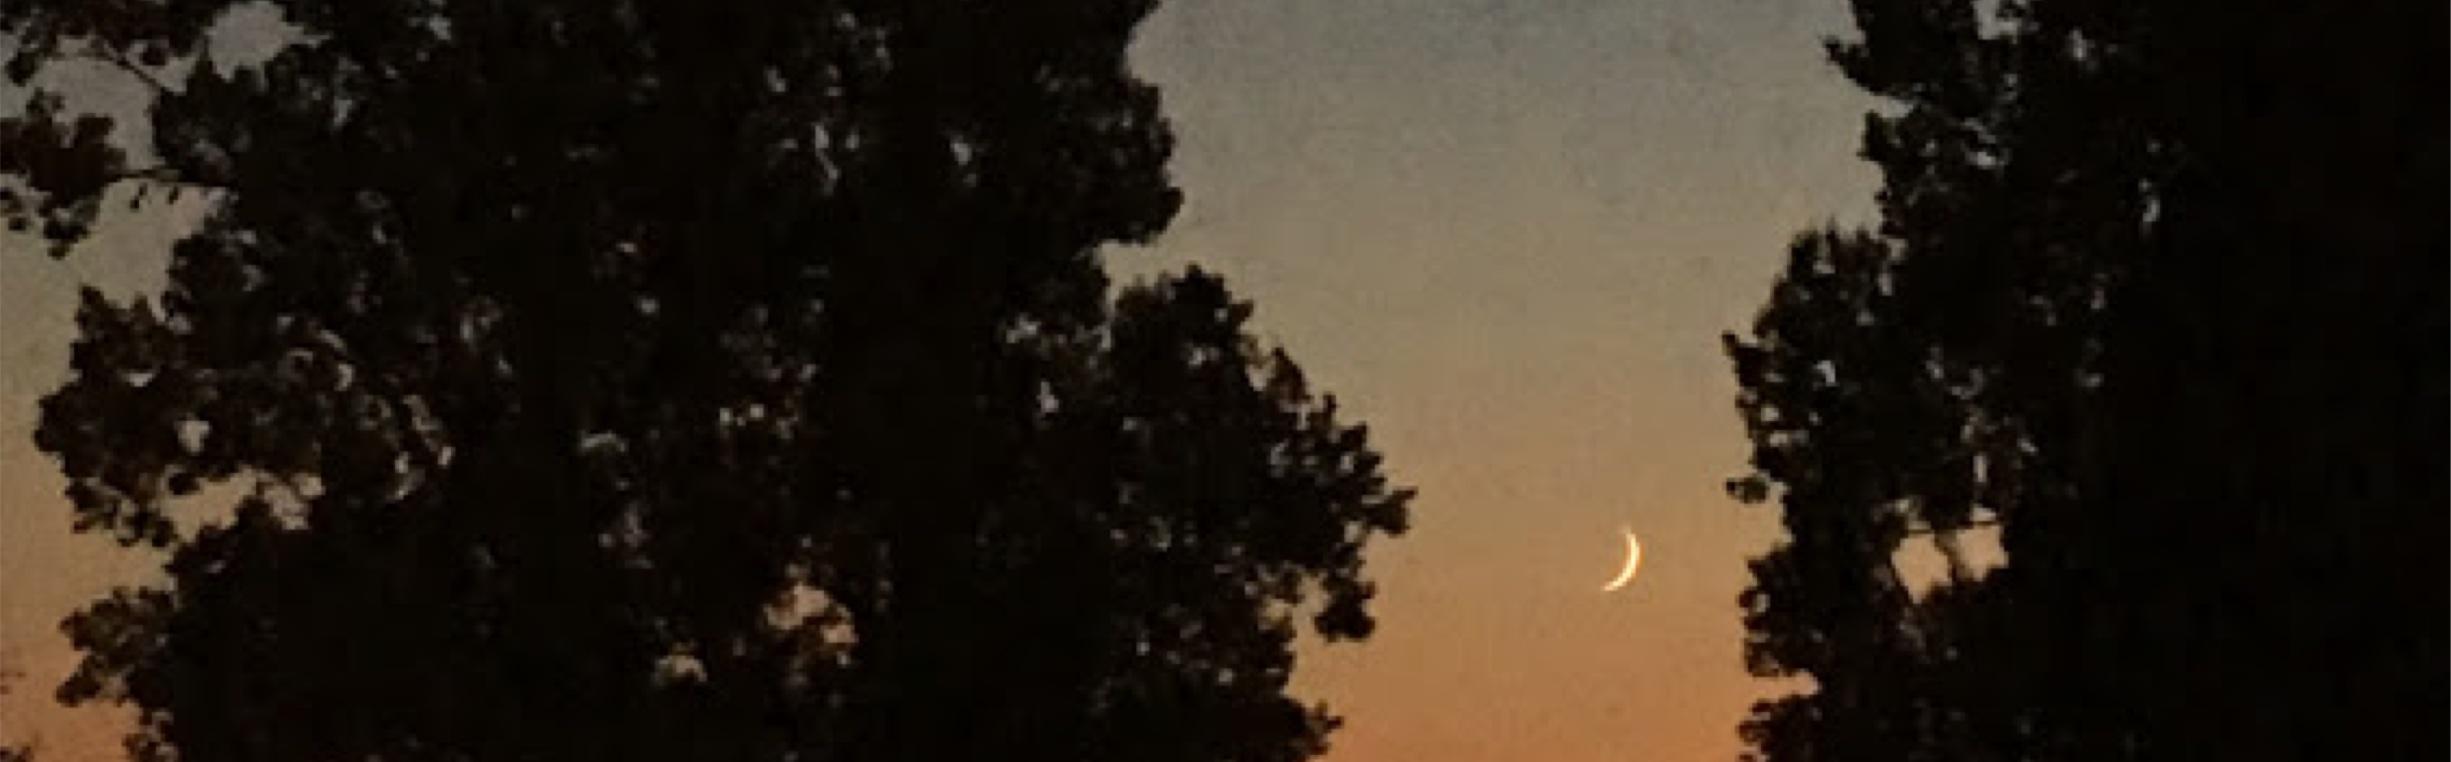 Blog_header image_moon.jpg